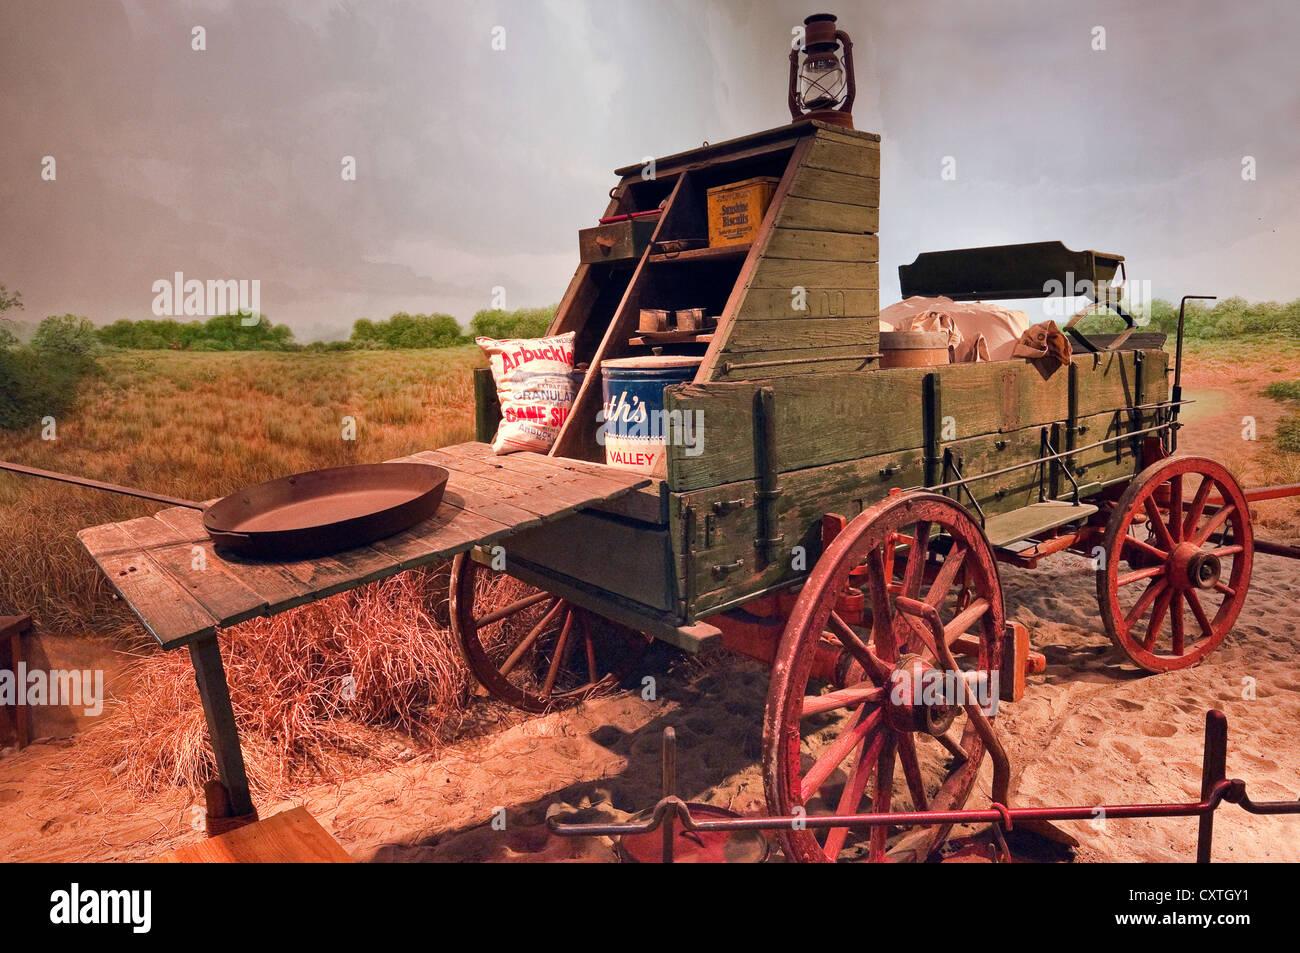 Chuck Wagon (late 19th century), Museum of South Texas History, Edinburg, Rio Grande Valley, Texas, USA - Stock Image